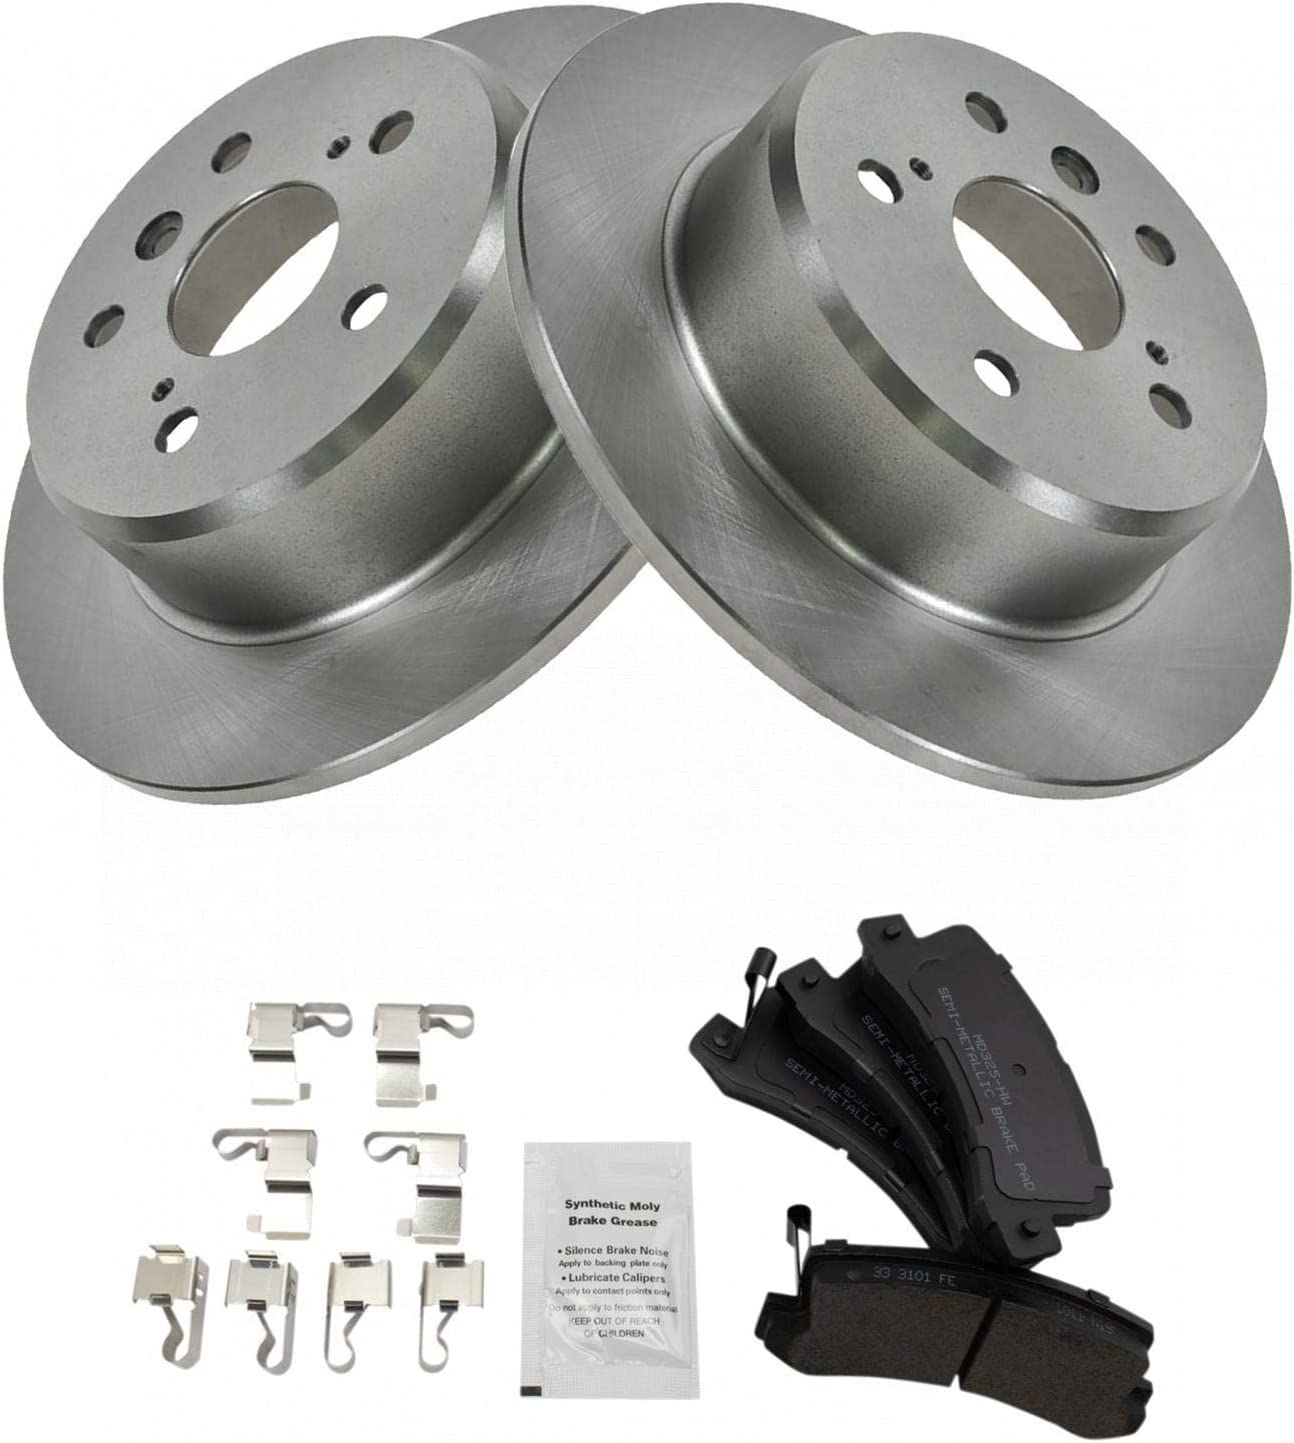 Rear Semi Metalic Brake Pads /& G-Coated Rotor Kit for 2002-2003 Lexus ES300